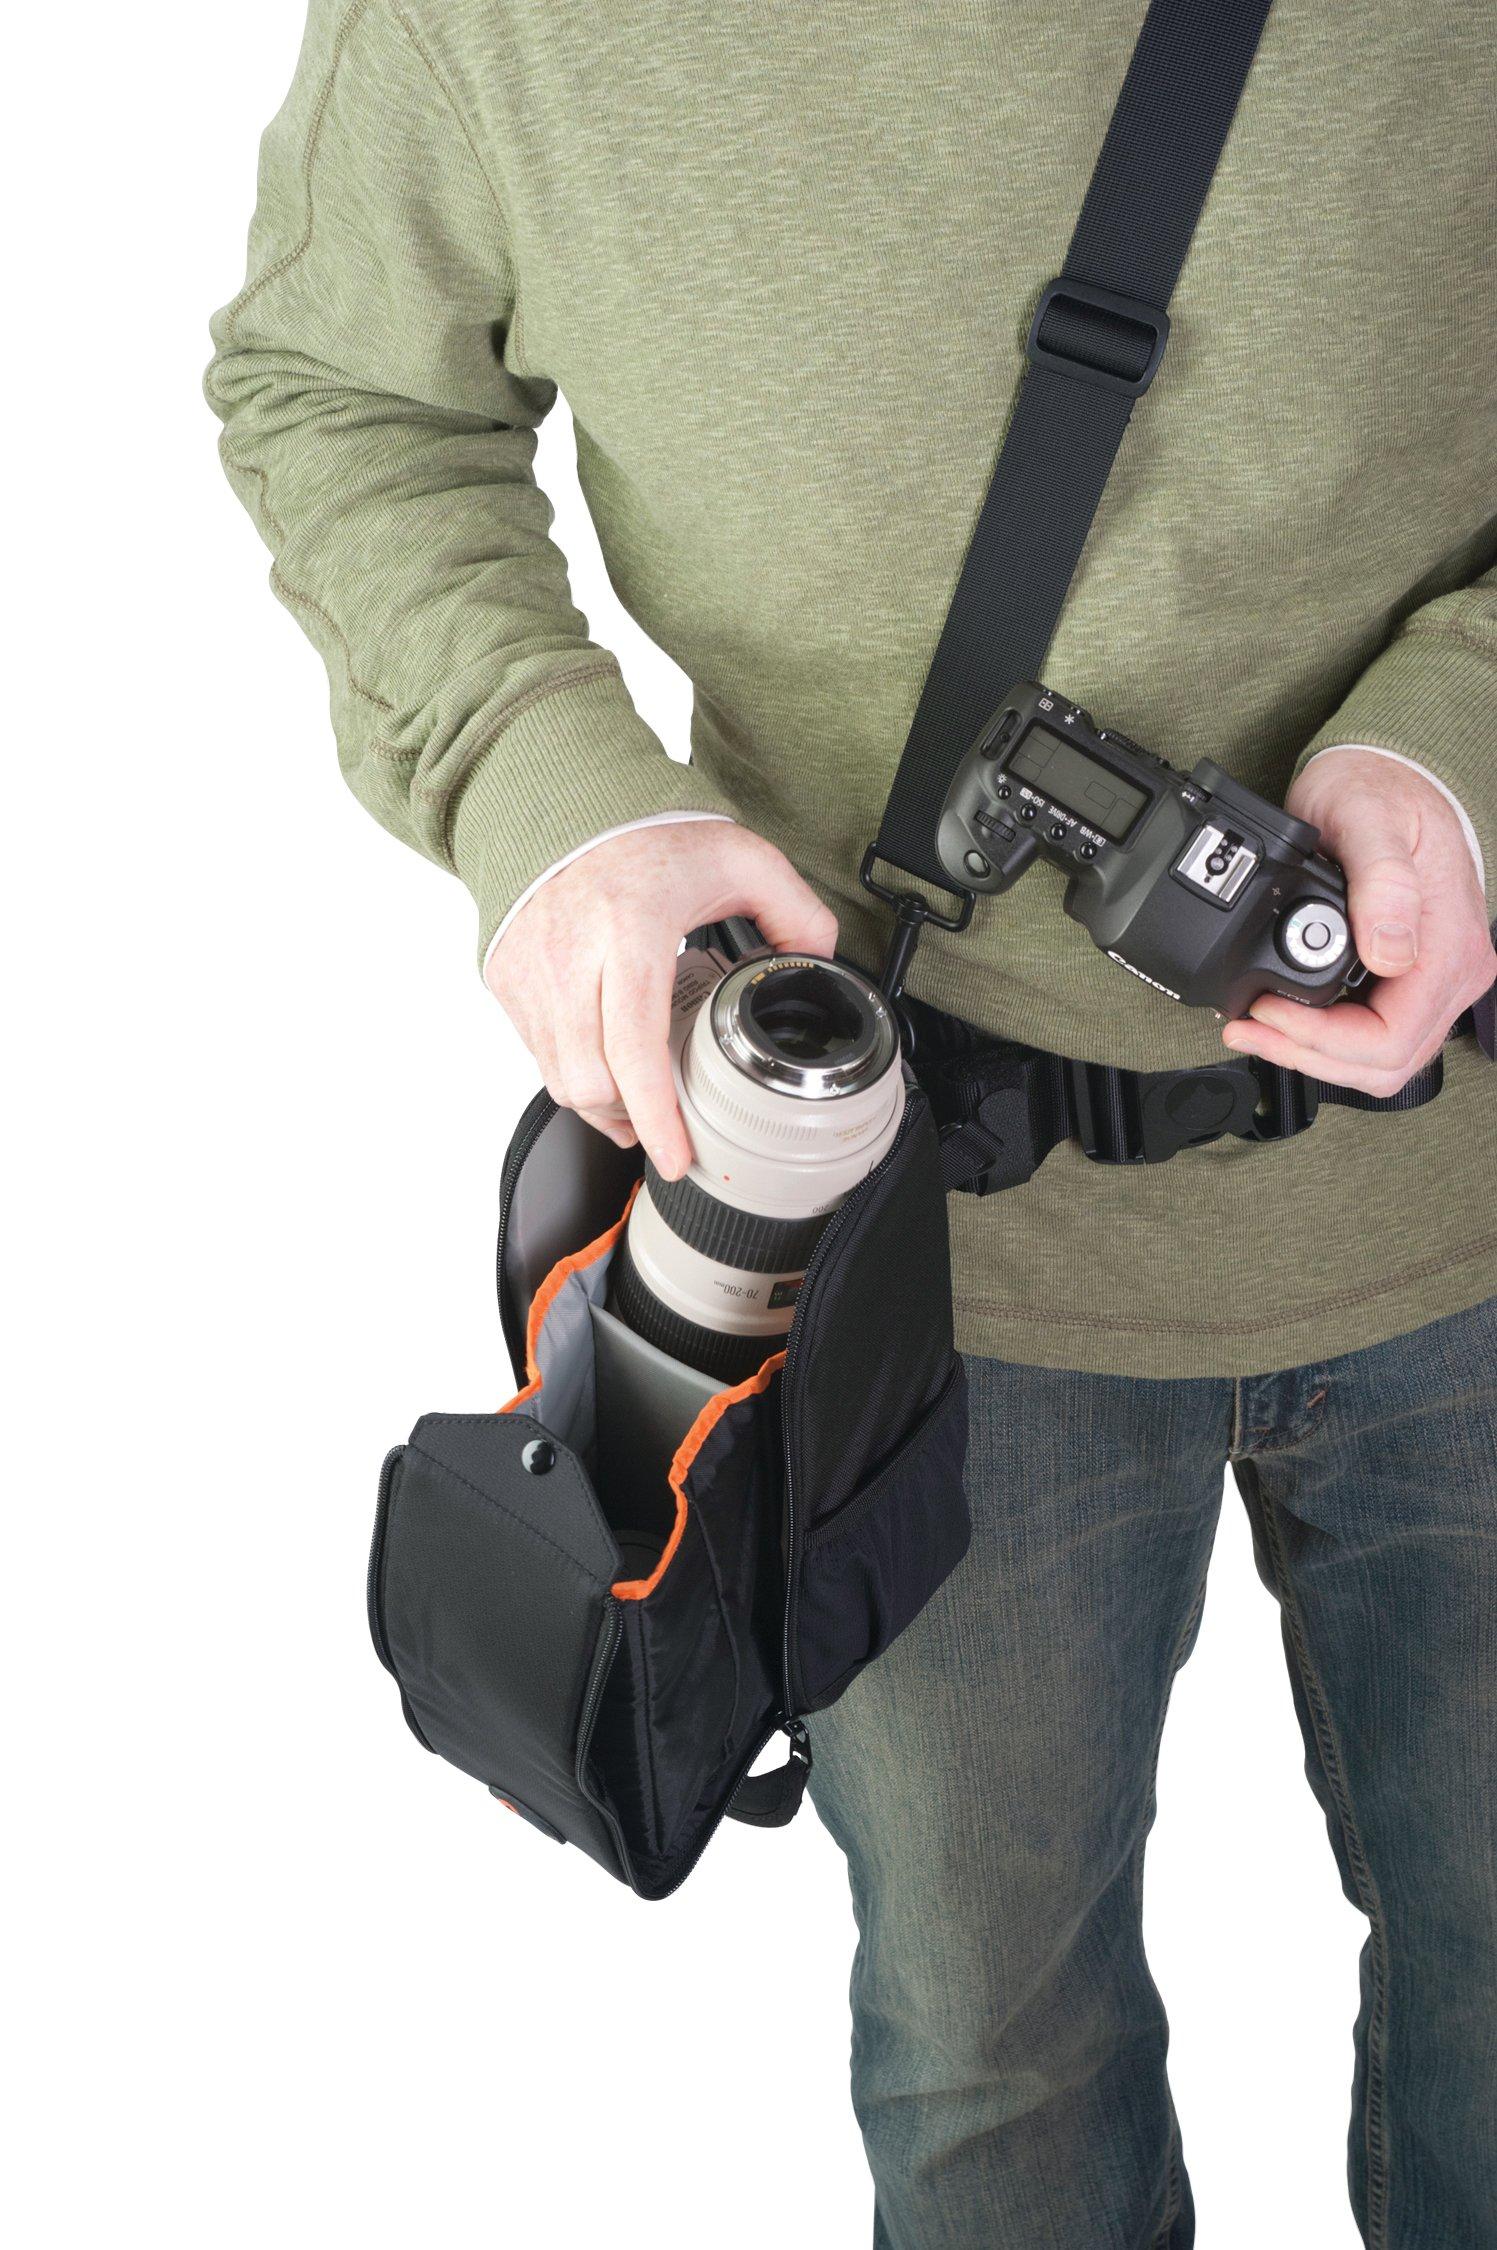 Lowepro S&F Lens Exchange 200 AW by Lowepro